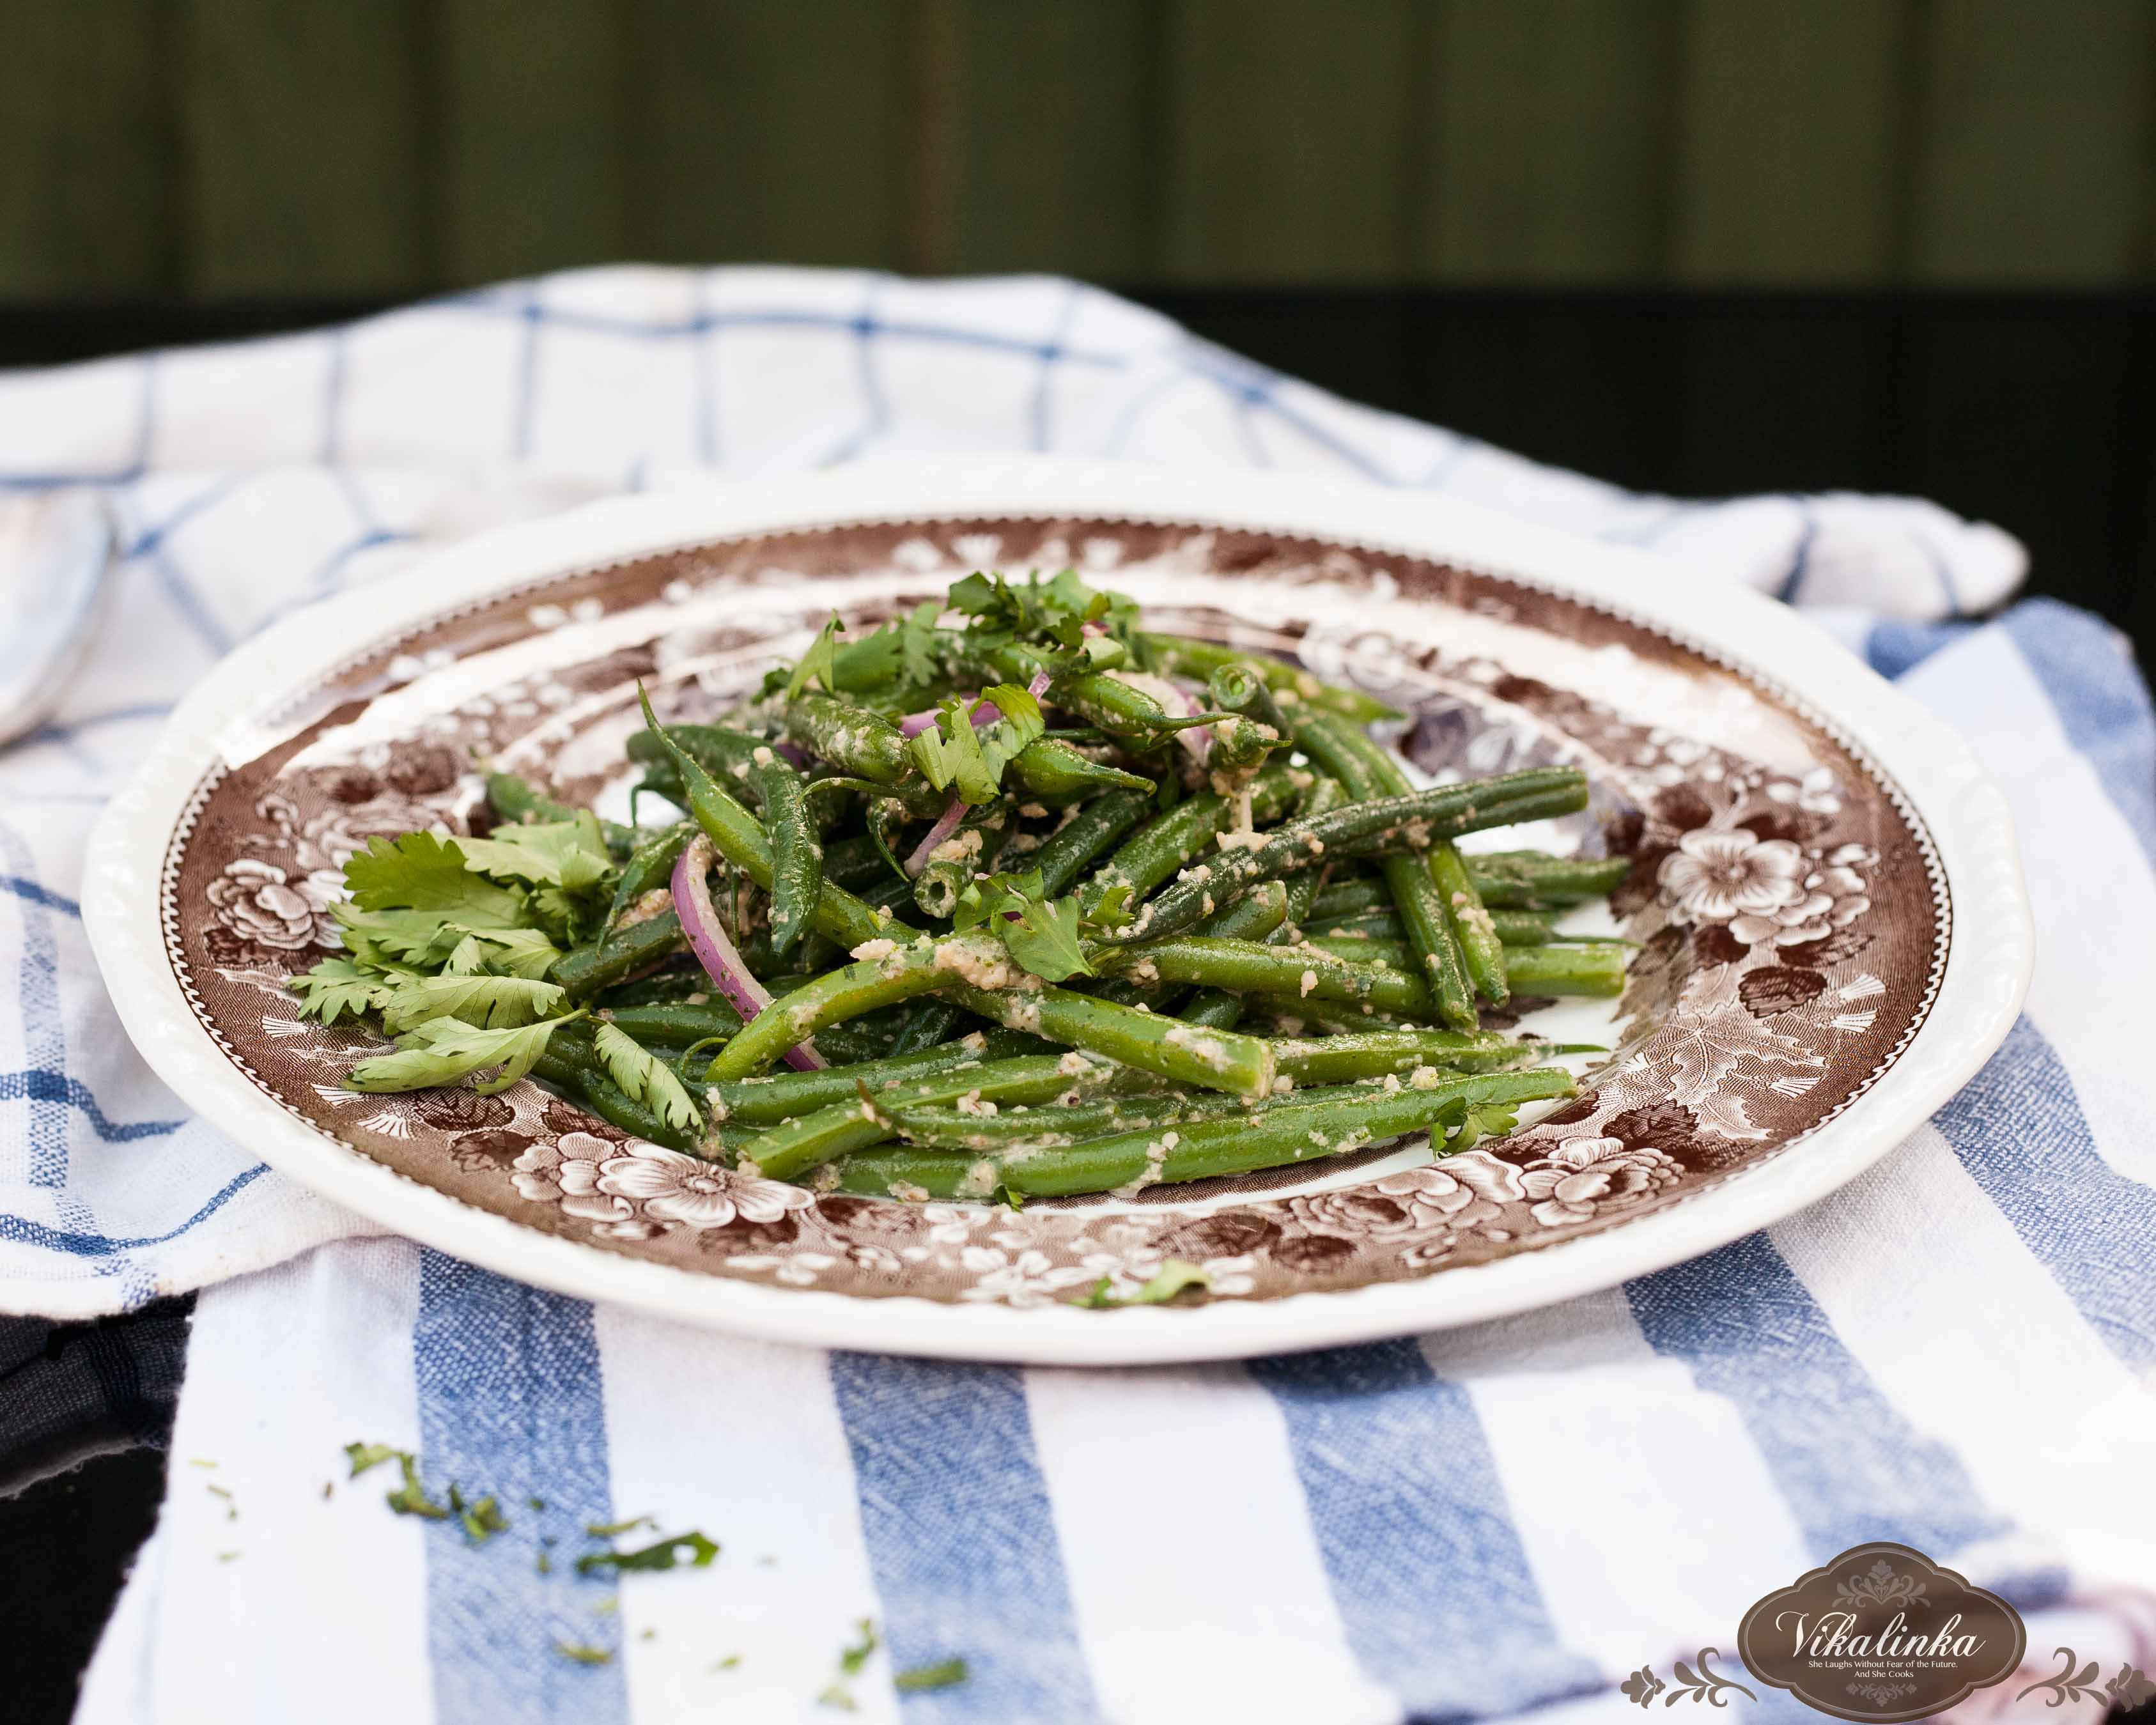 Green Beans in Walnut Garlic Dressing